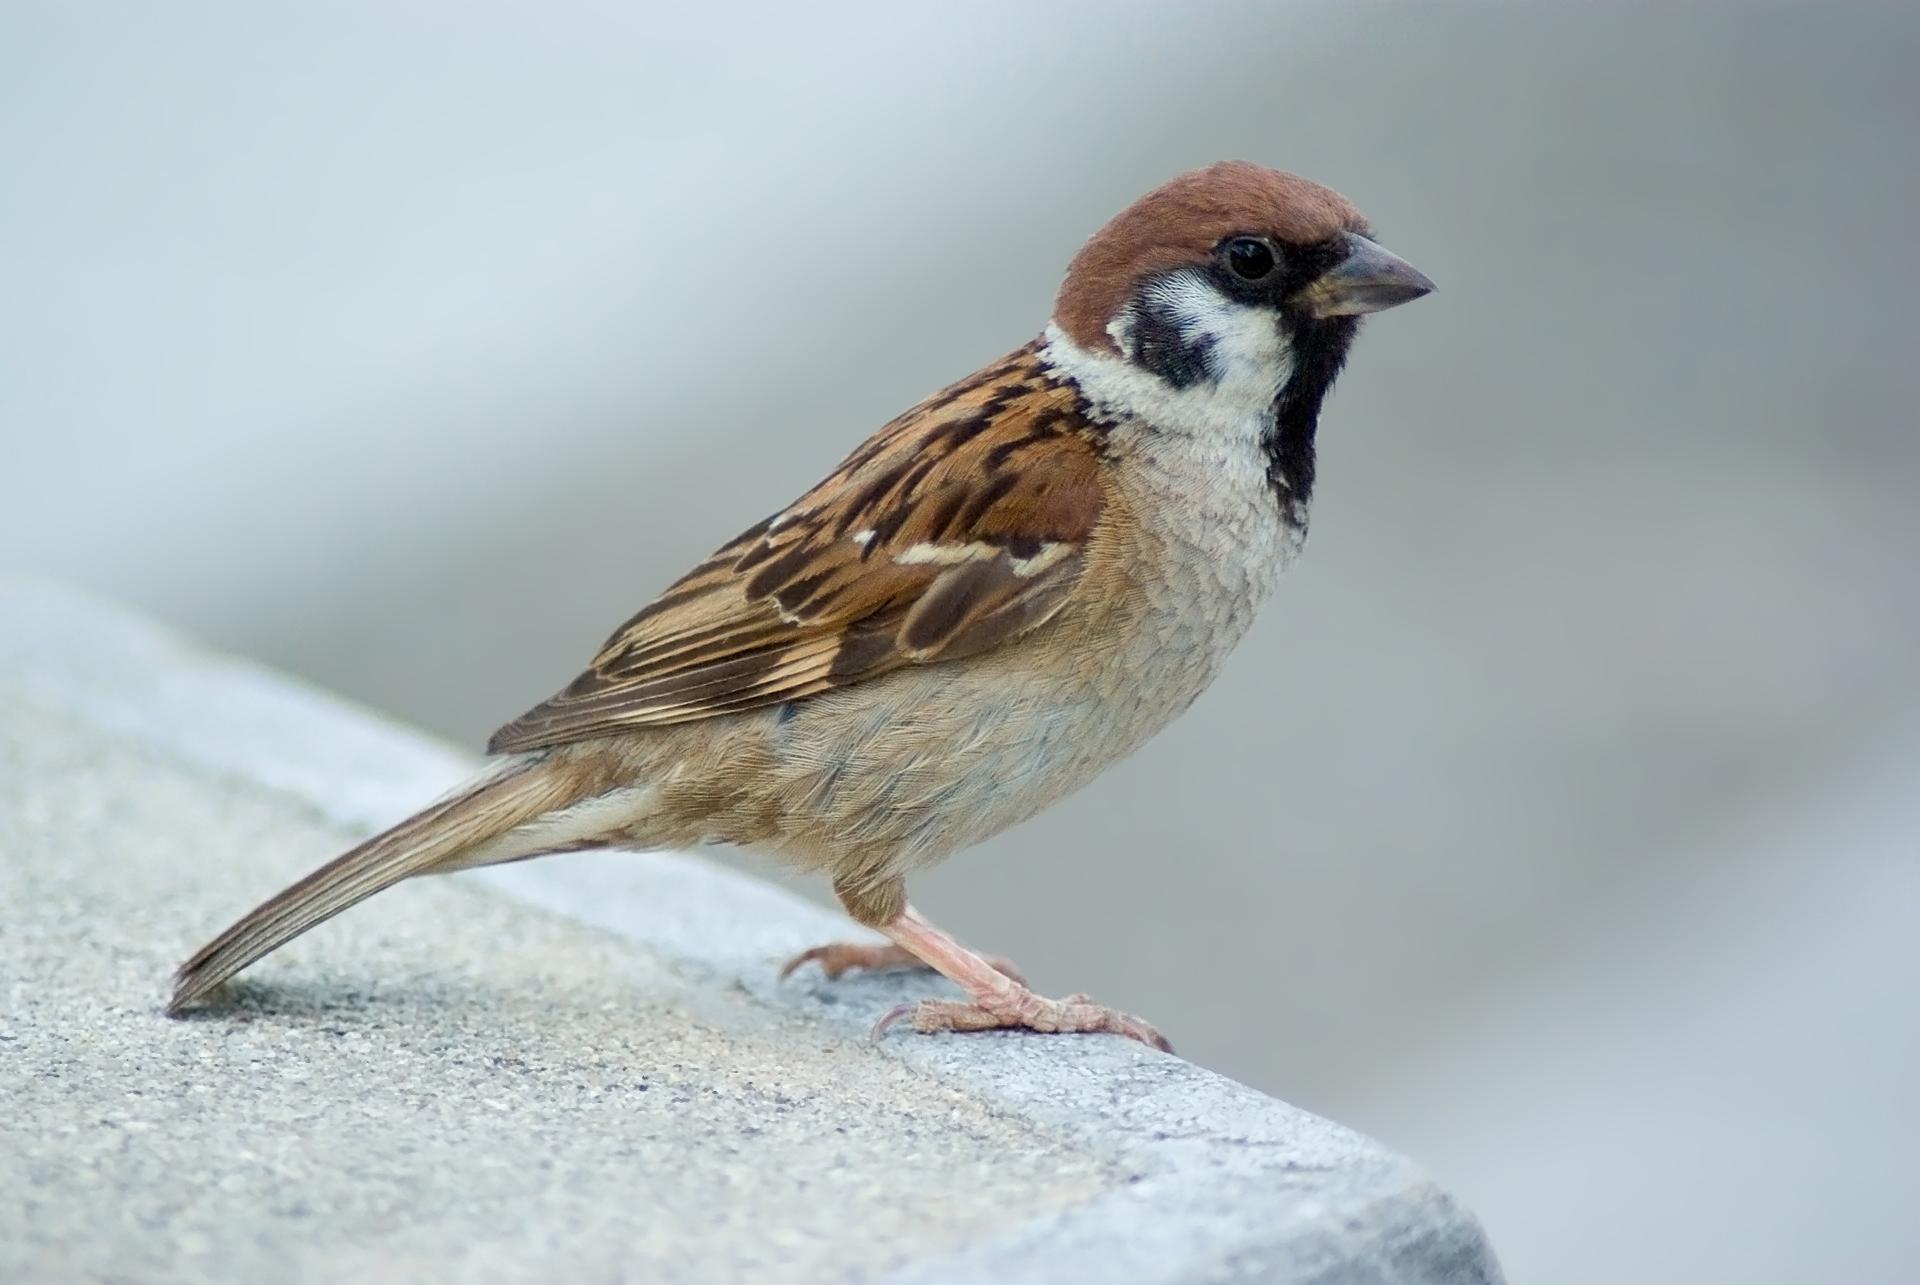 Tree_Sparrow_August_2007_Osaka_Japan.jpg